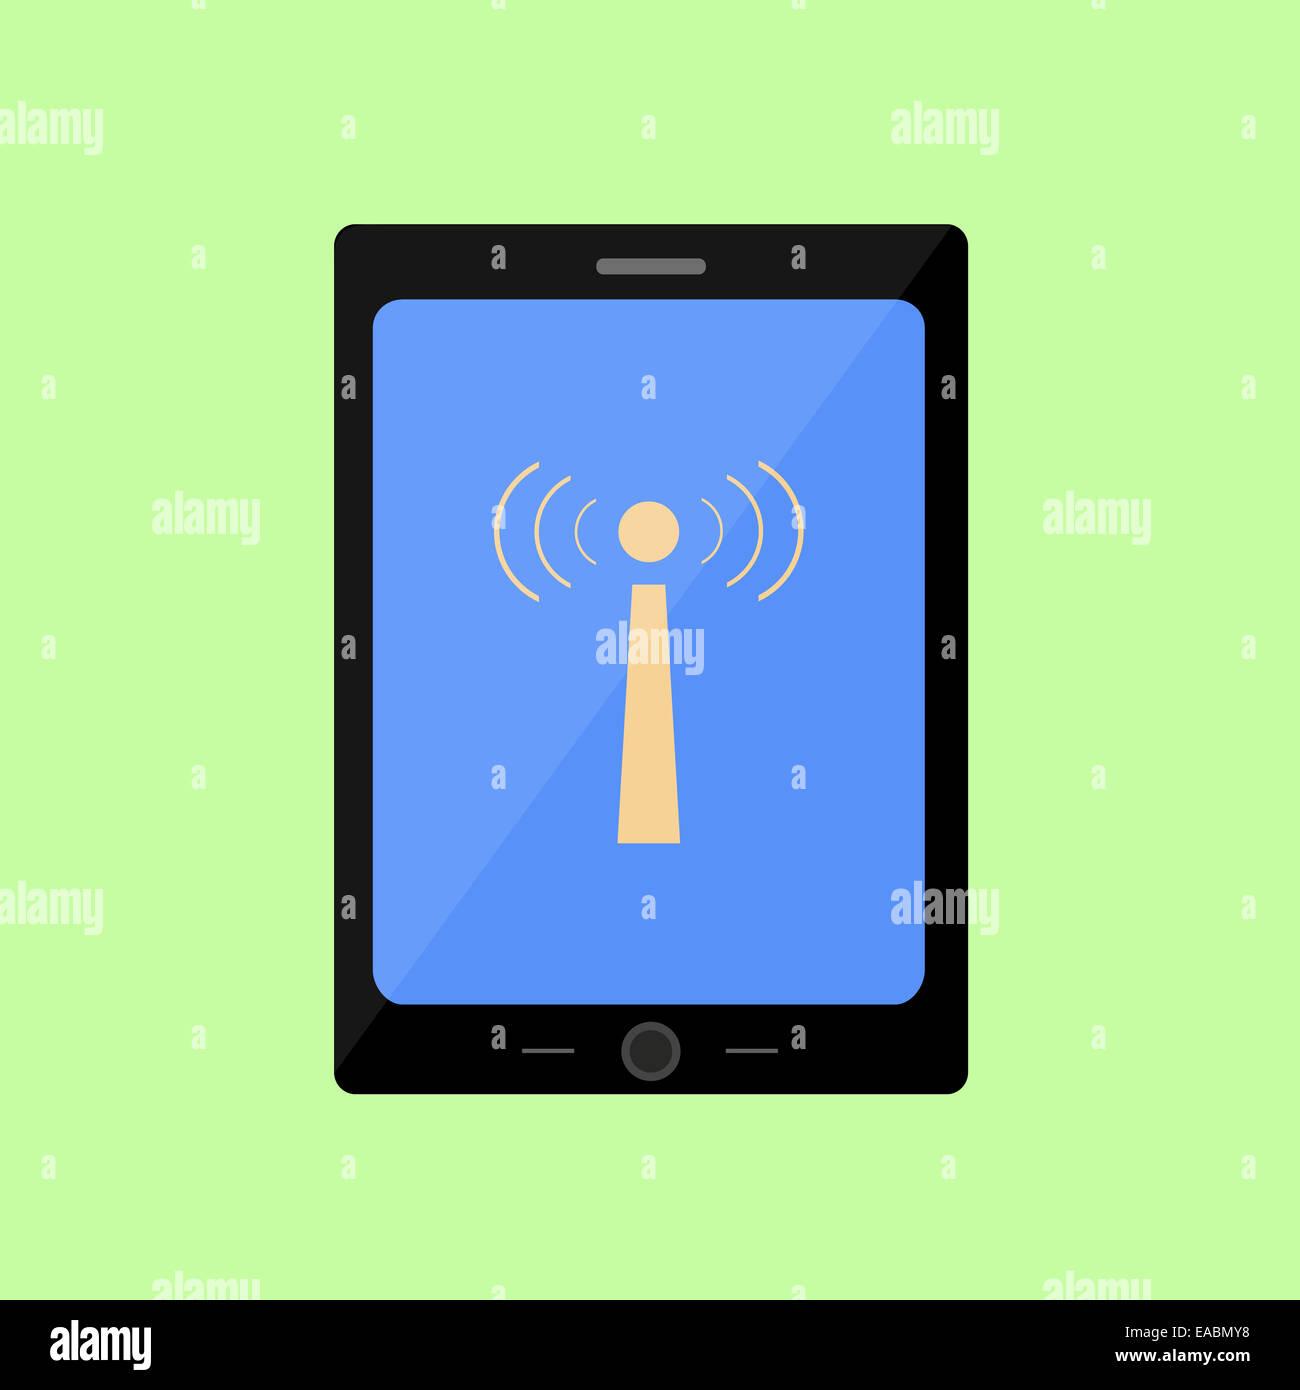 Style plat pavé tactile avec icône wi-fi Photo Stock